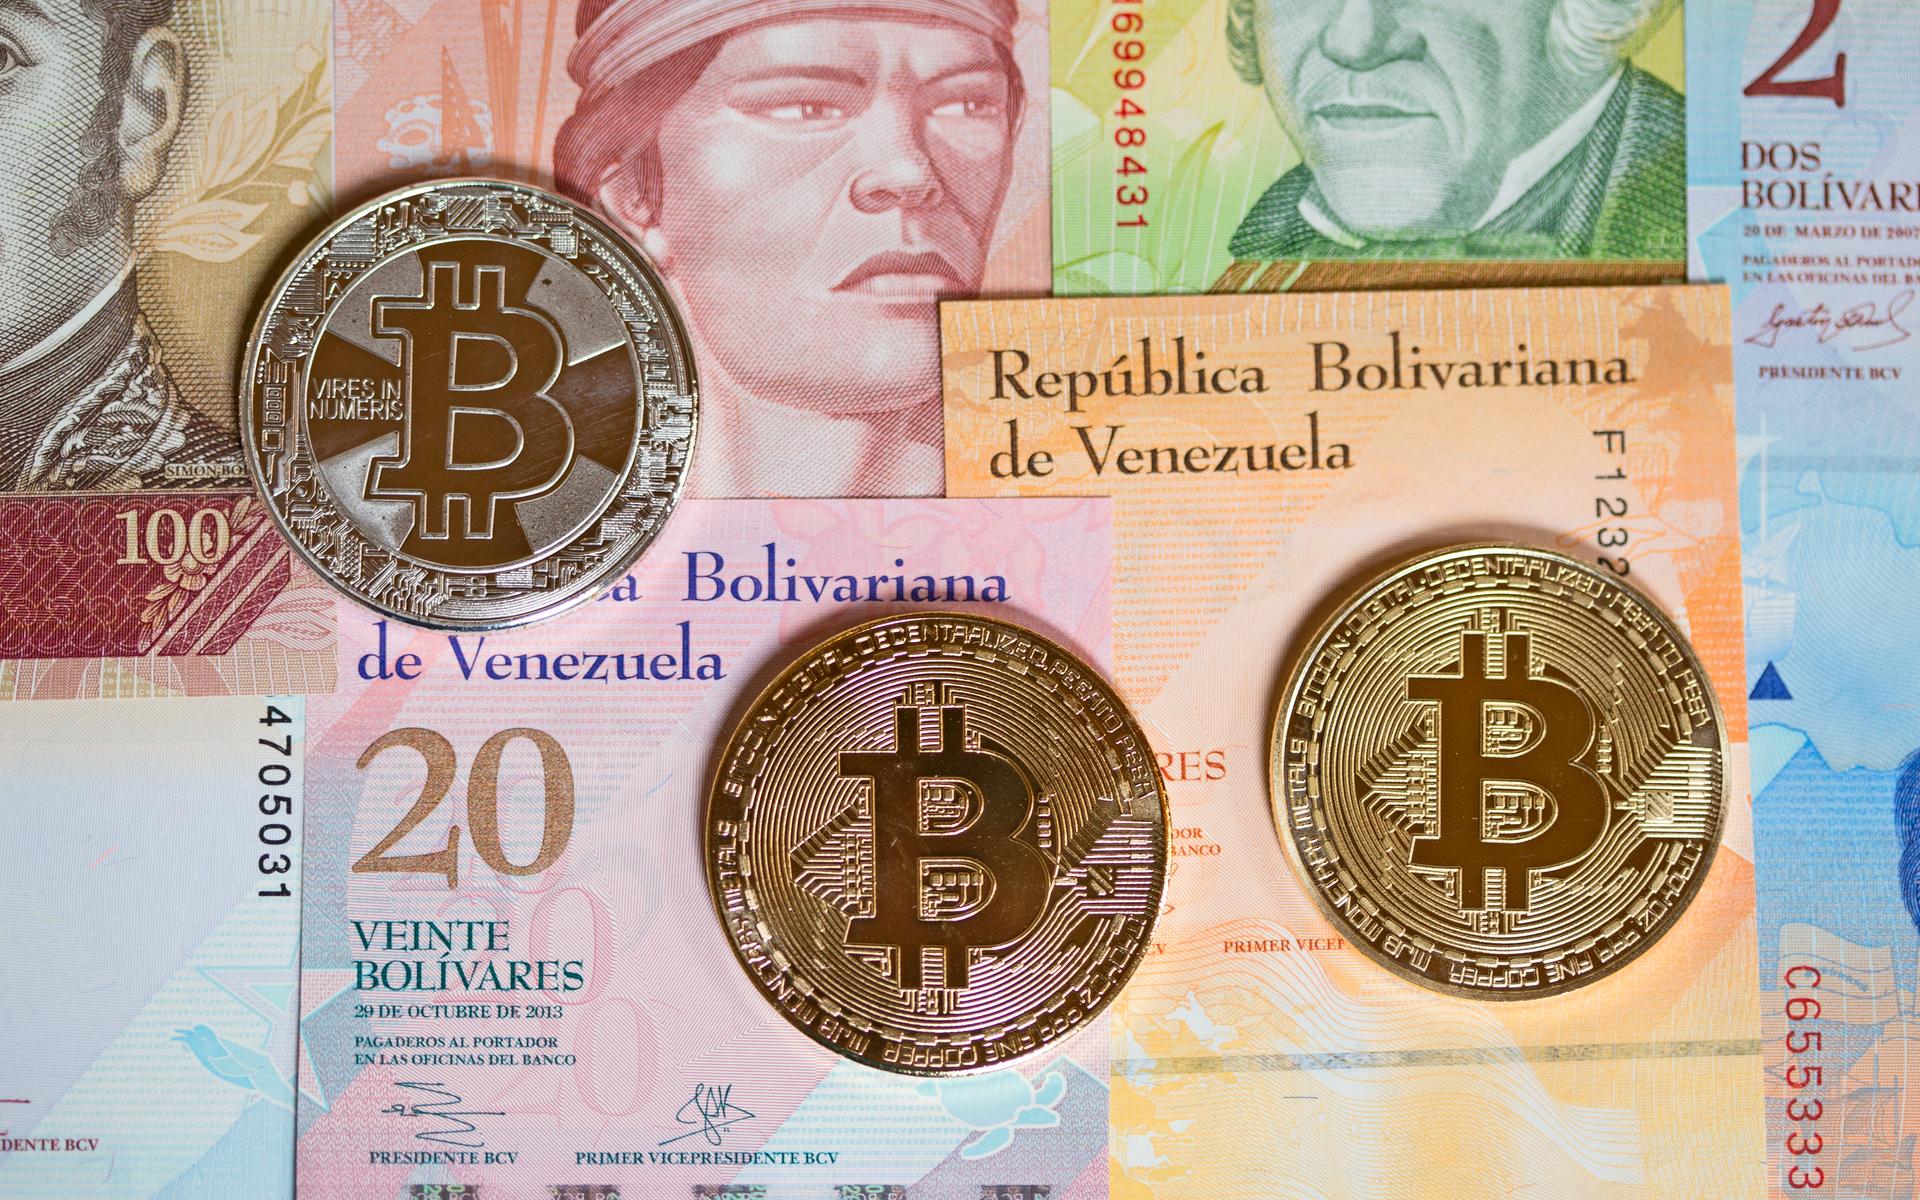 venezuela btc price trading volume localbitcoins